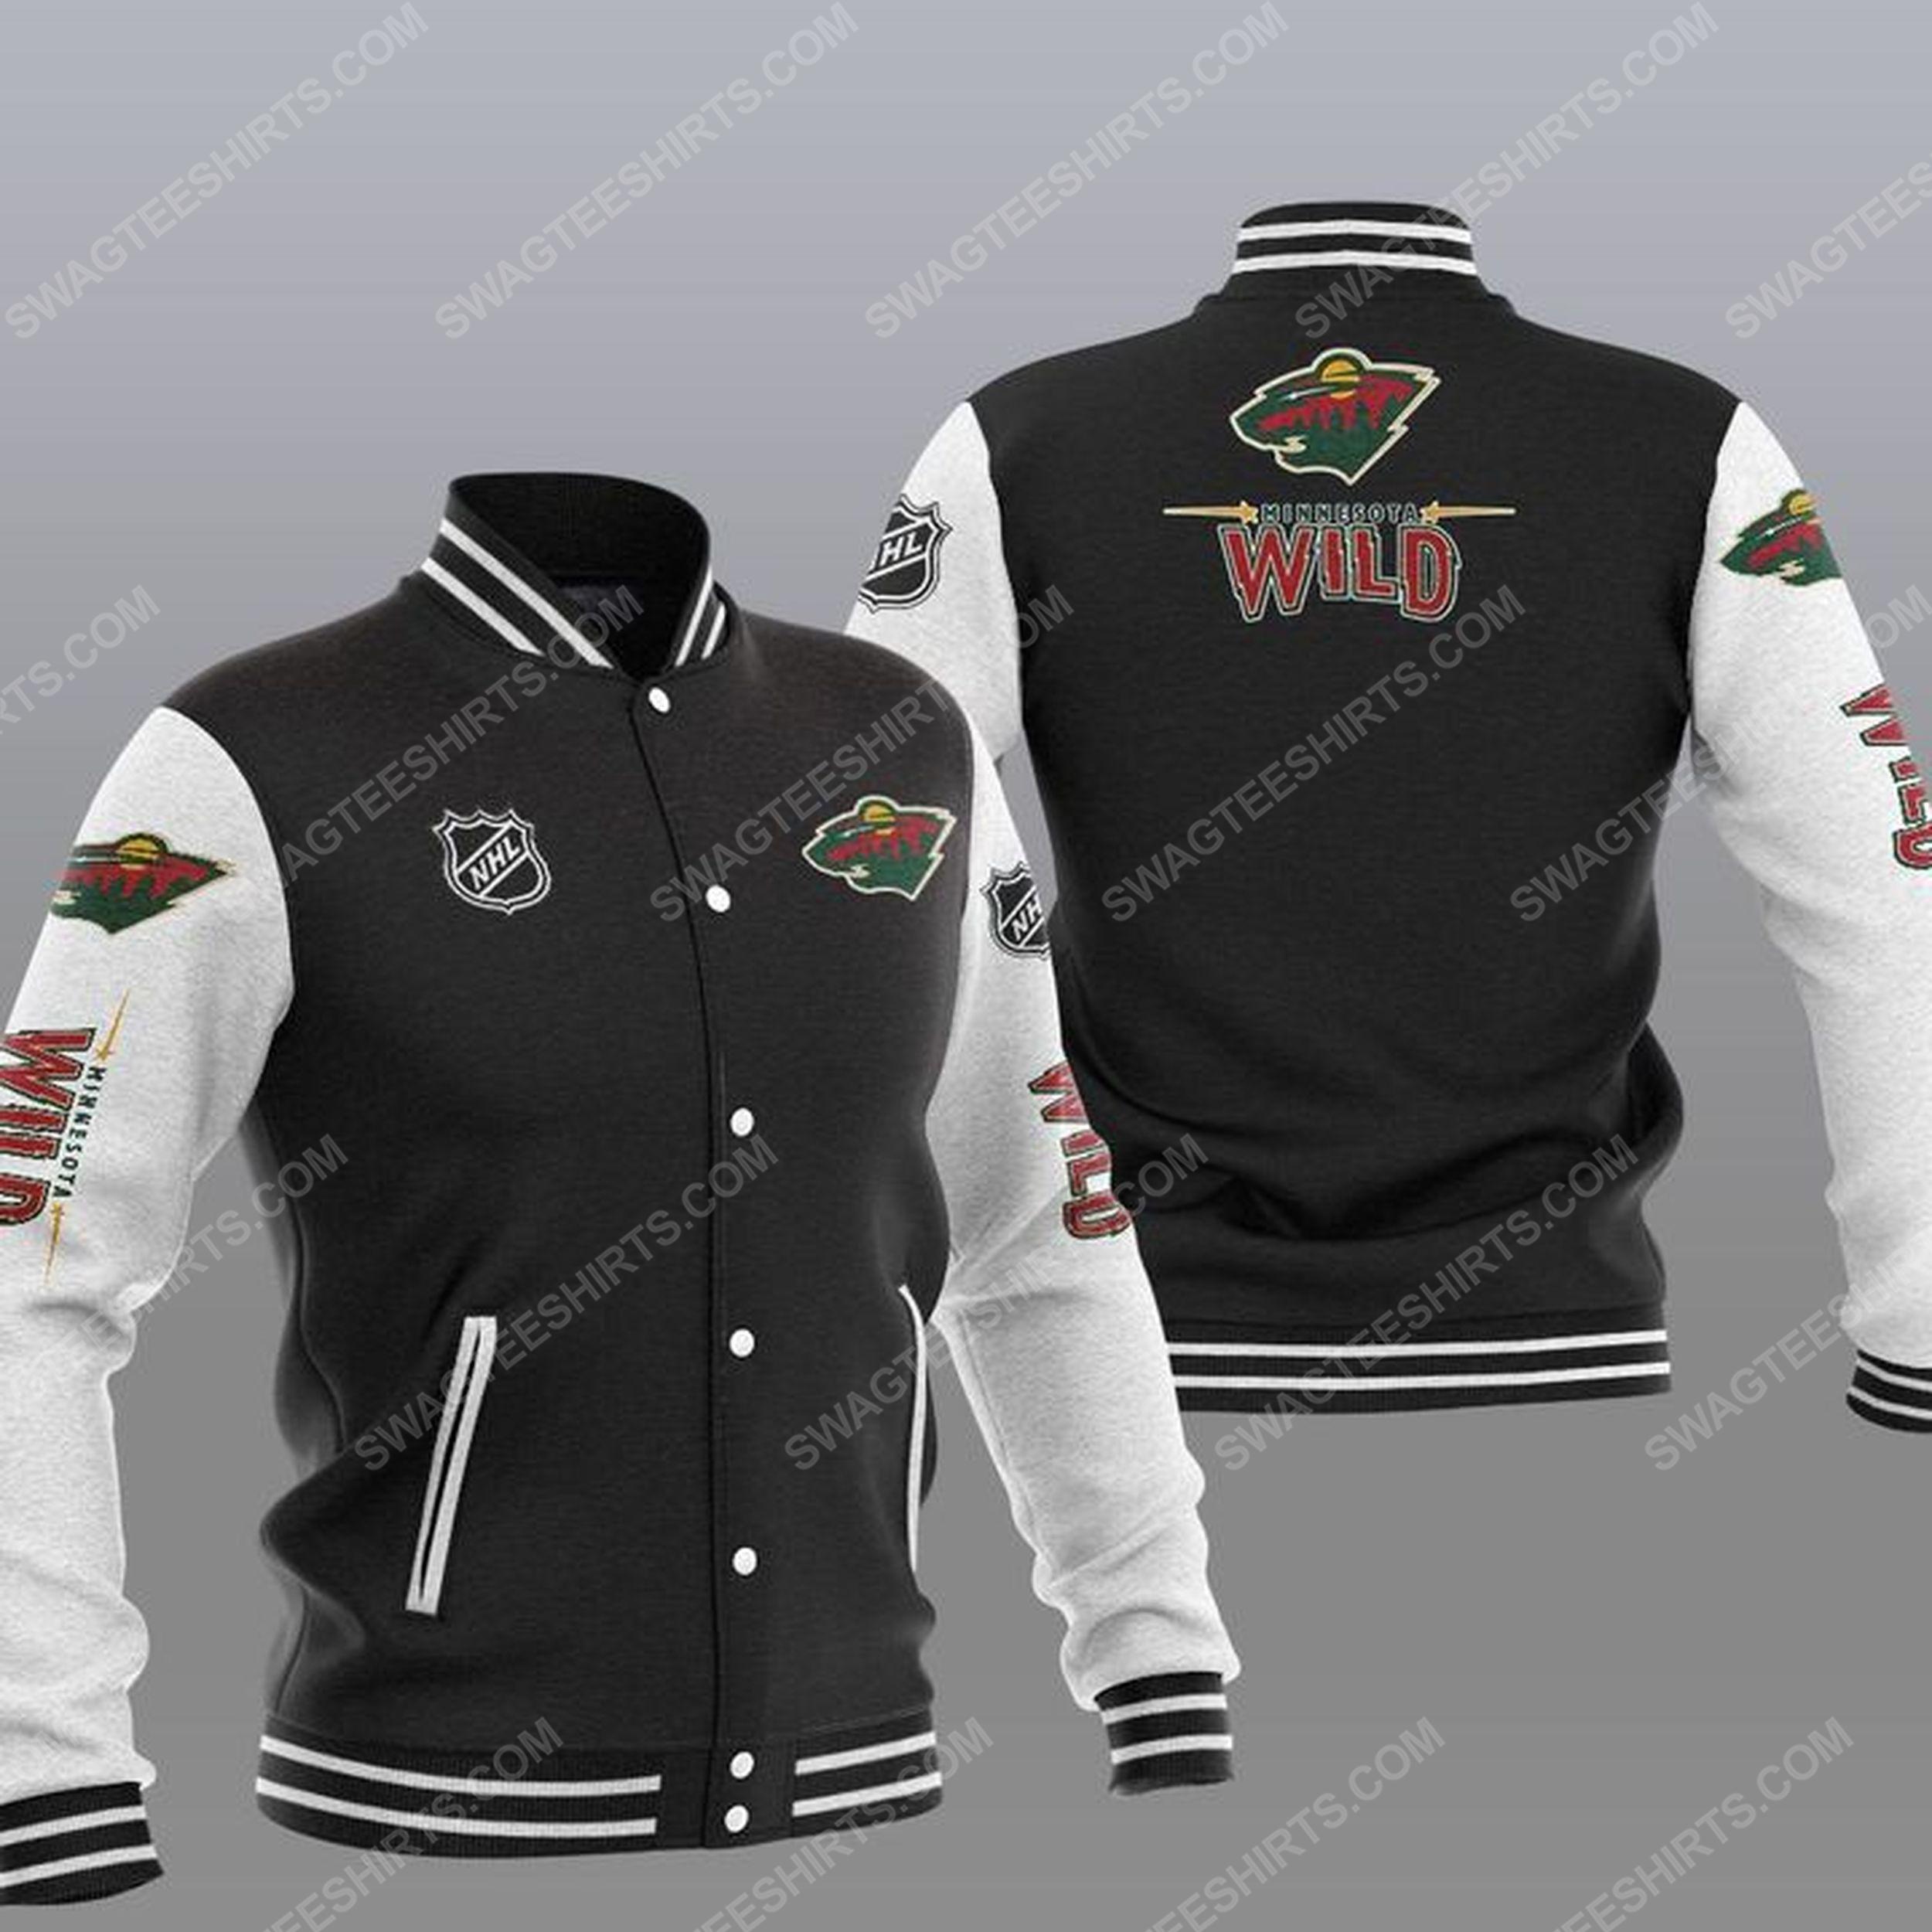 The minnesota wild nhl all over print baseball jacket - black 1